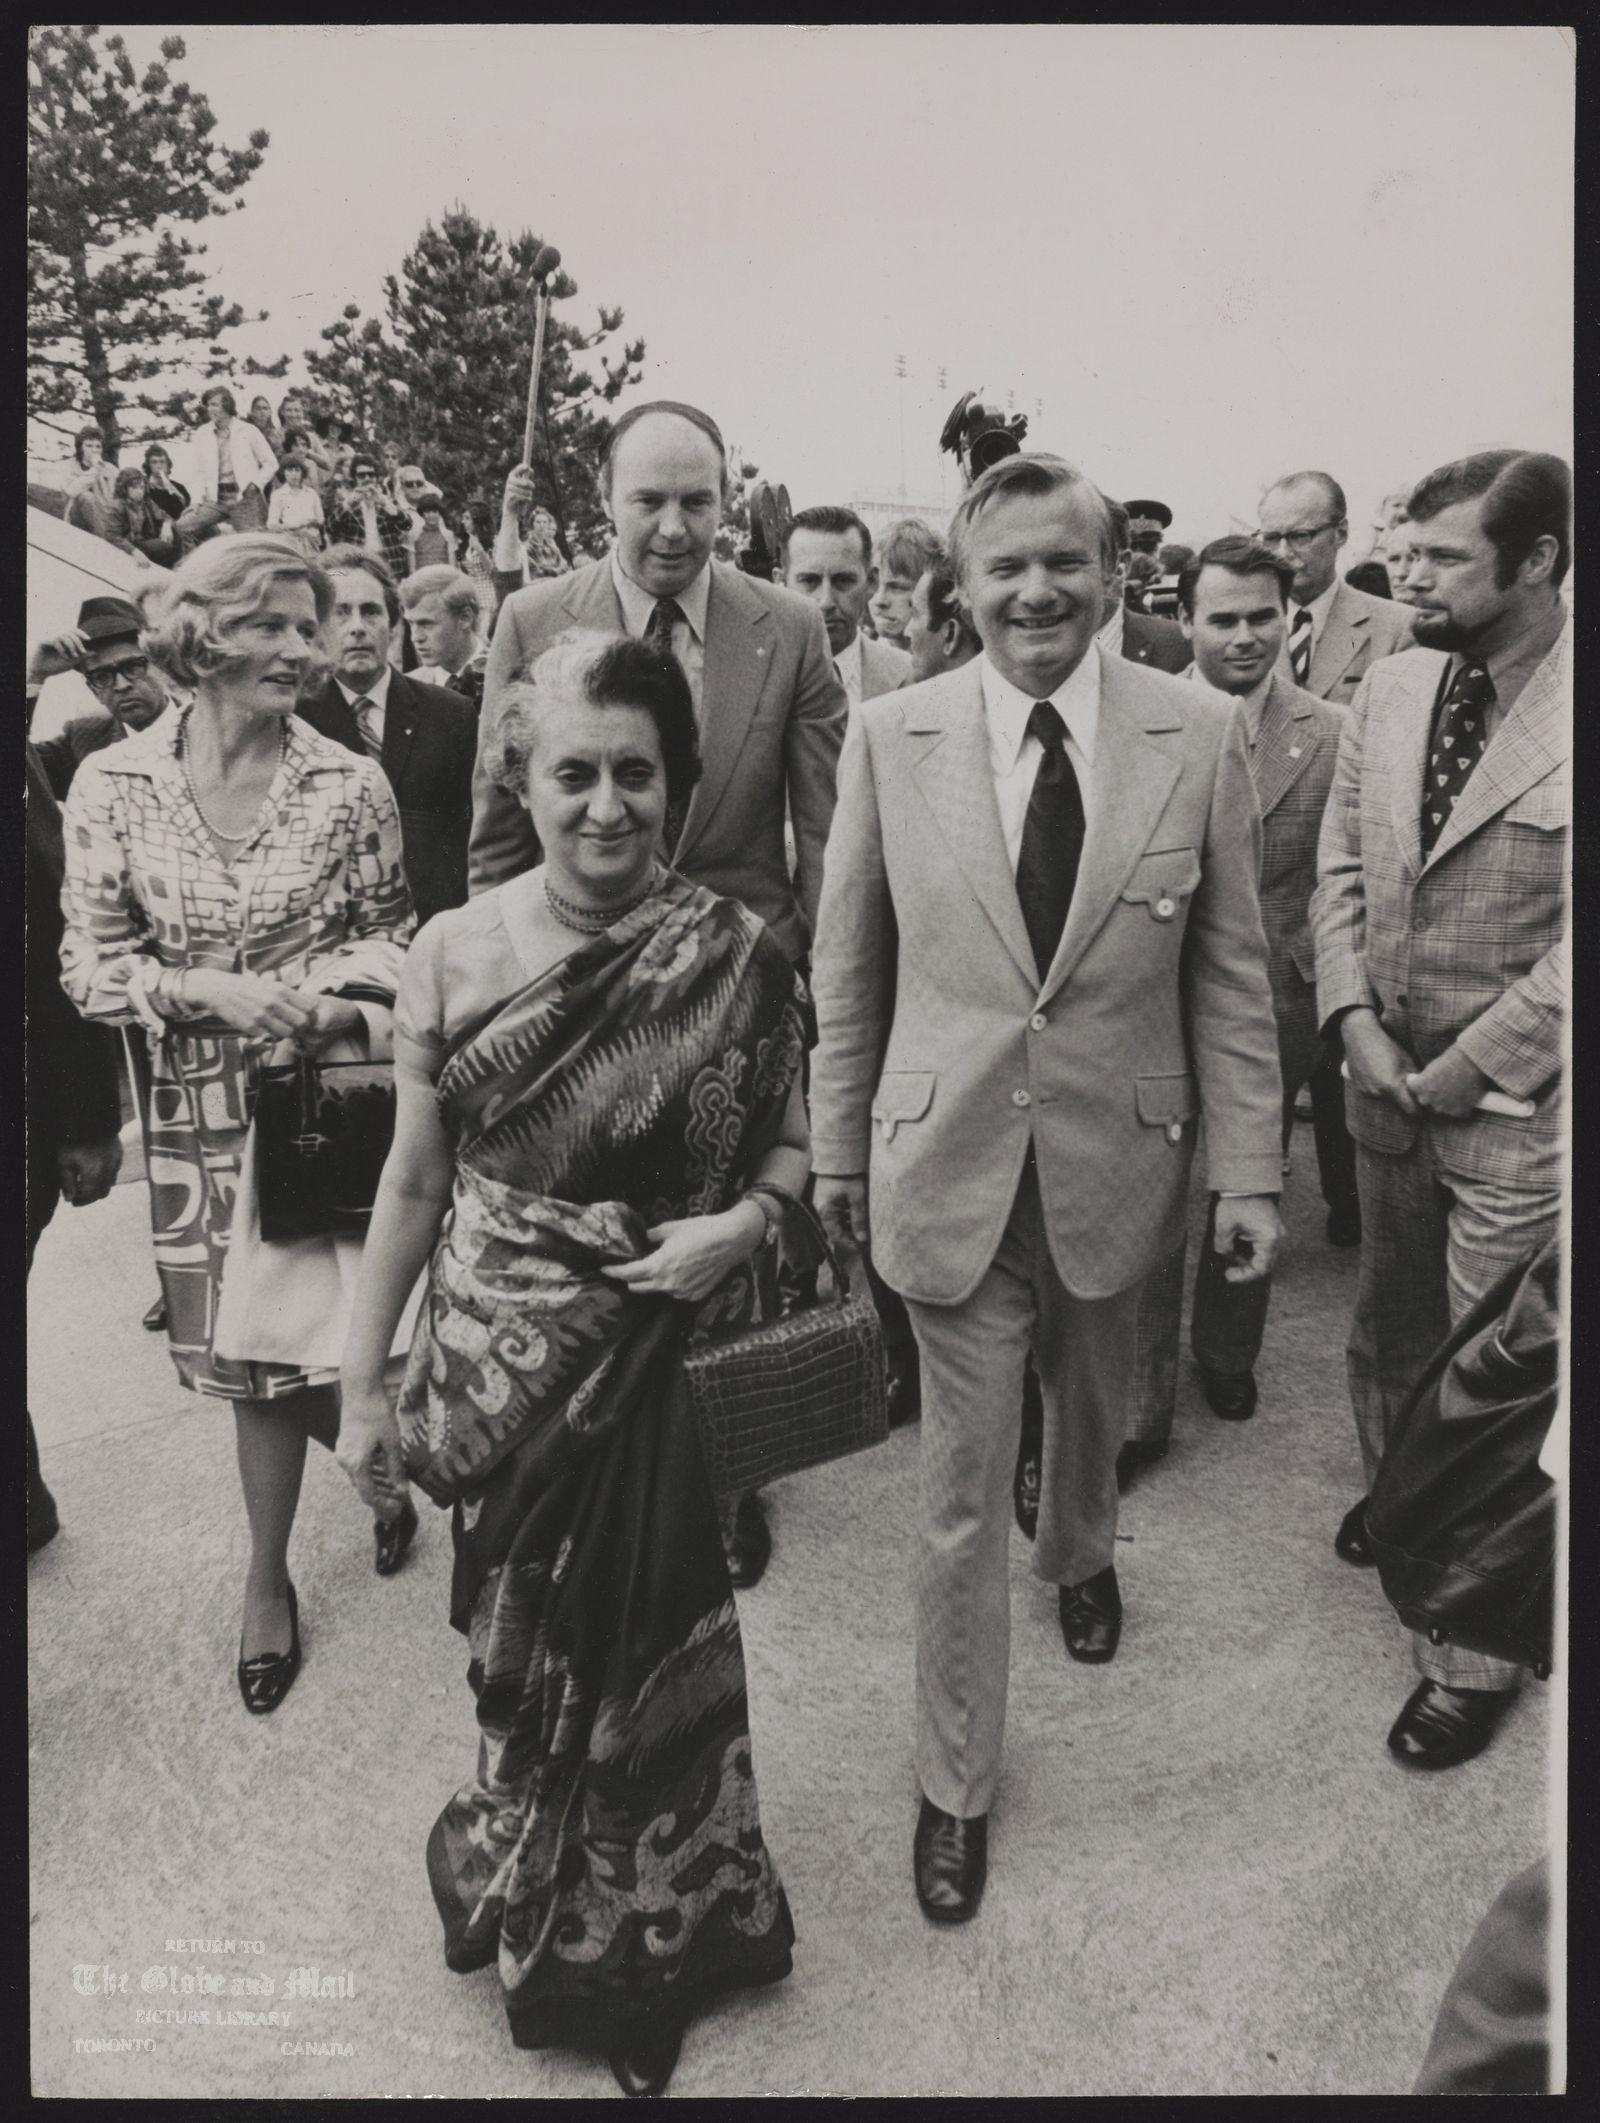 Indira GANDHI Indira Gandhi followed by Premier William Davis, visits Ontario Place